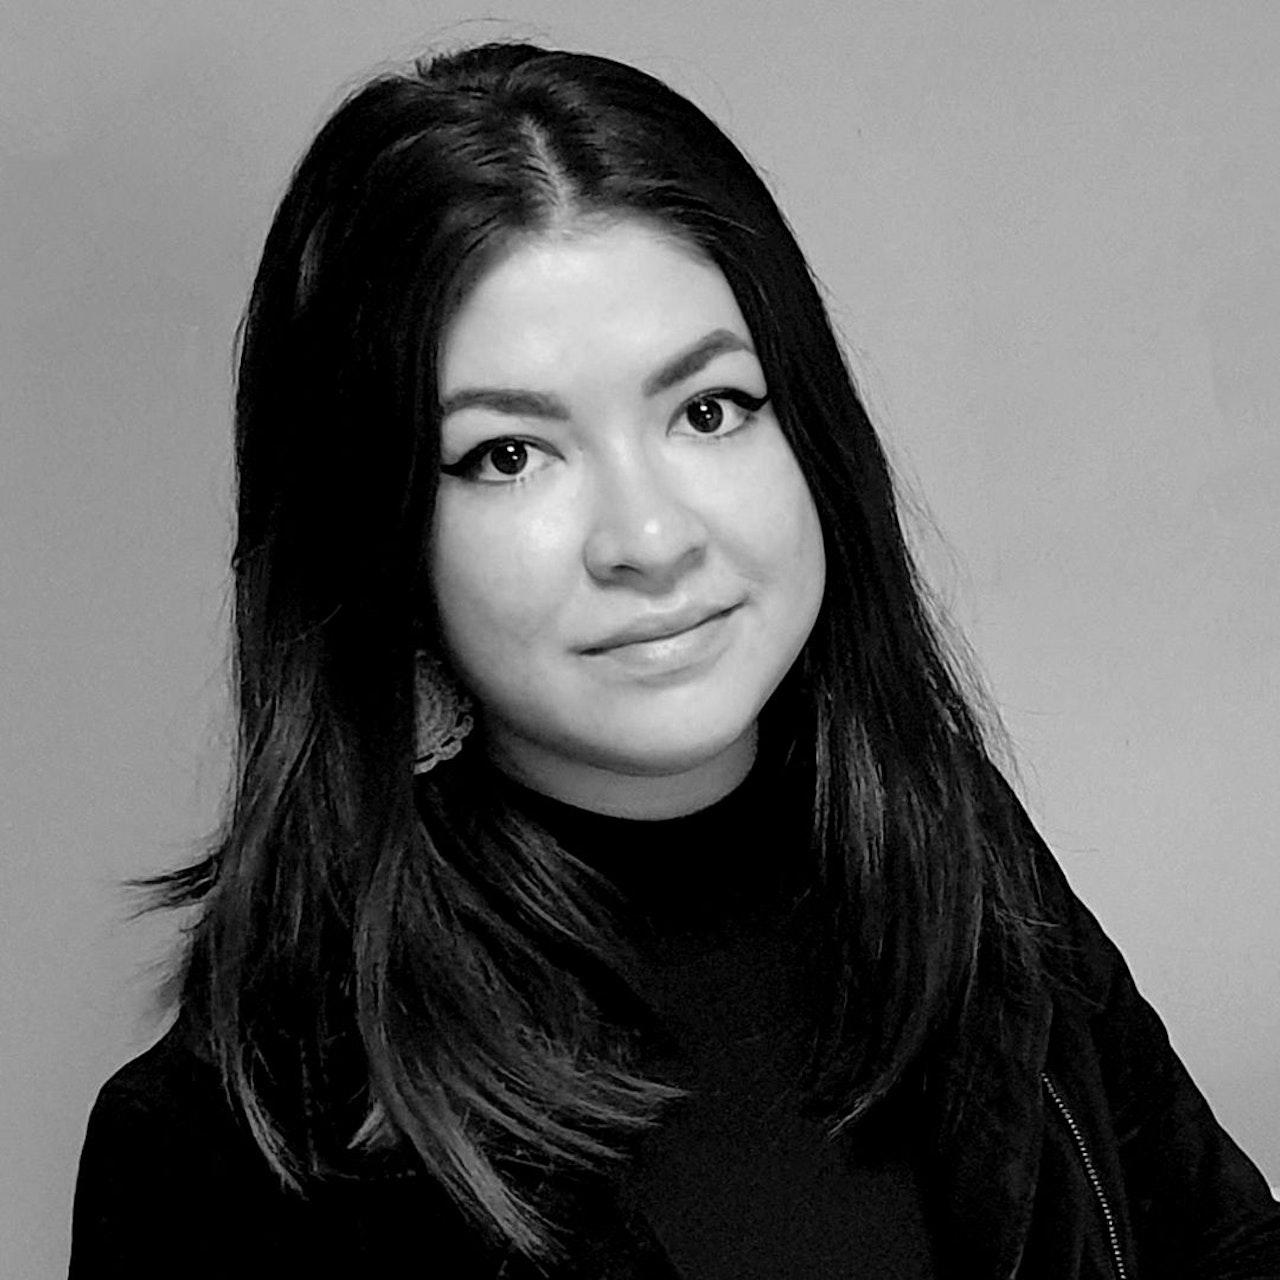 Profile image, Jenna Lee